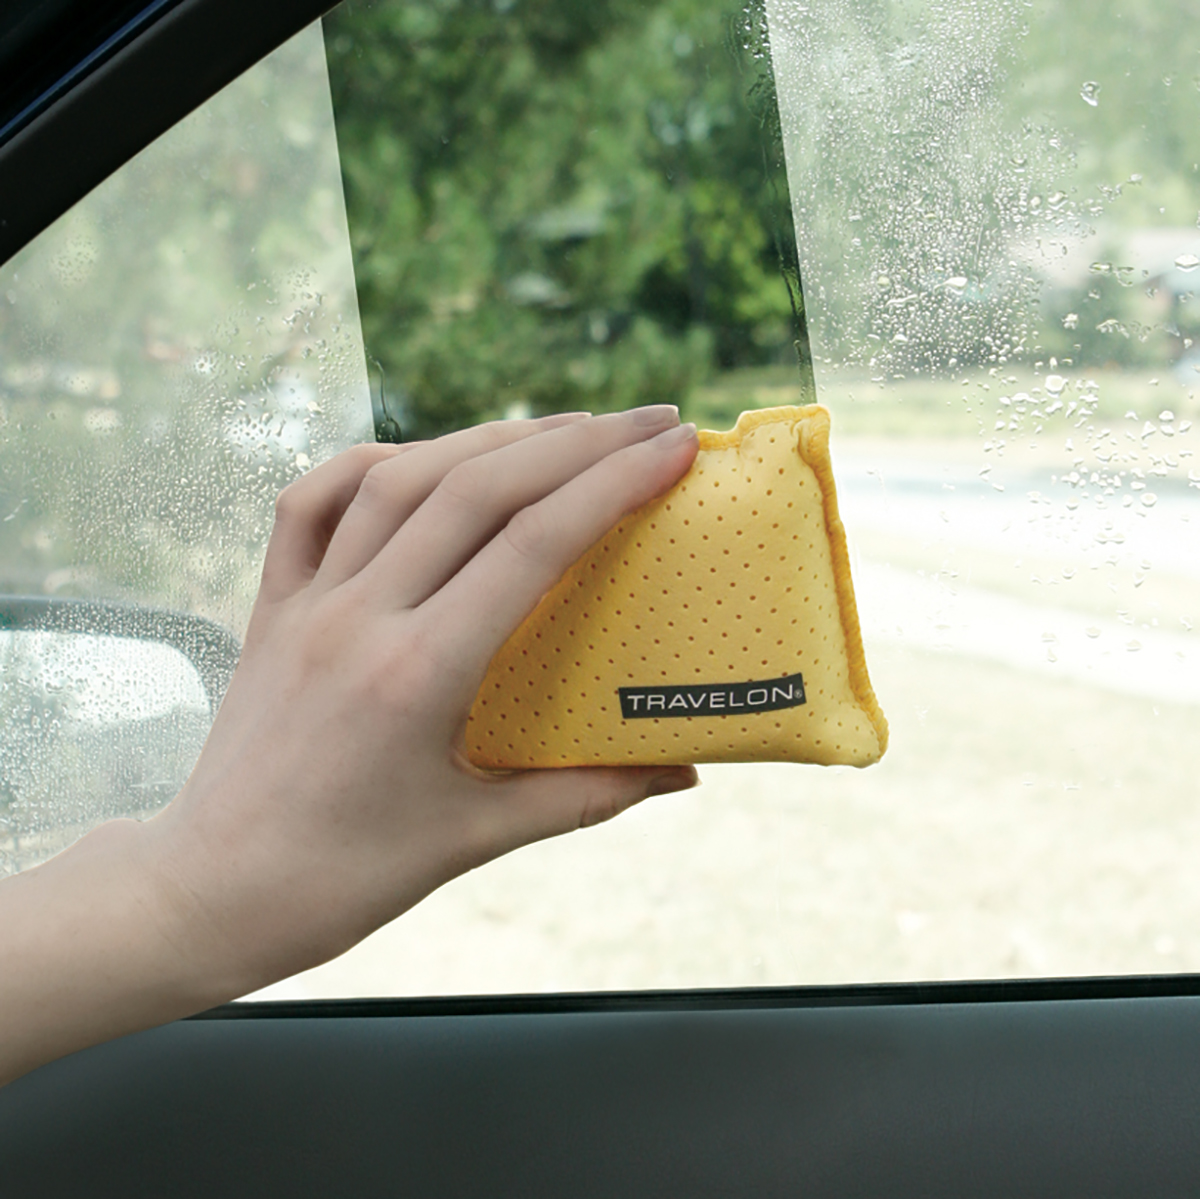 Travelon Window Cleaner & Defogger